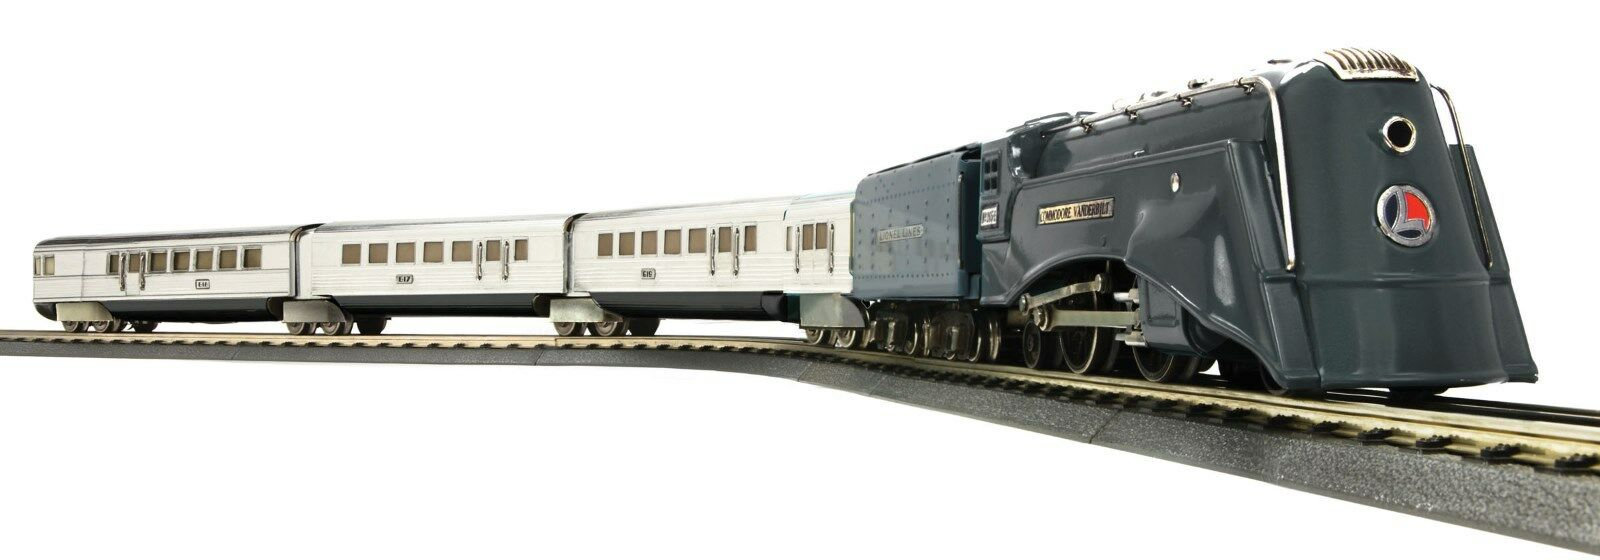 MTH Lionel Corp. Tinplate 295E O Gauge DC Ssquadra Passenger Set PS2 1160301